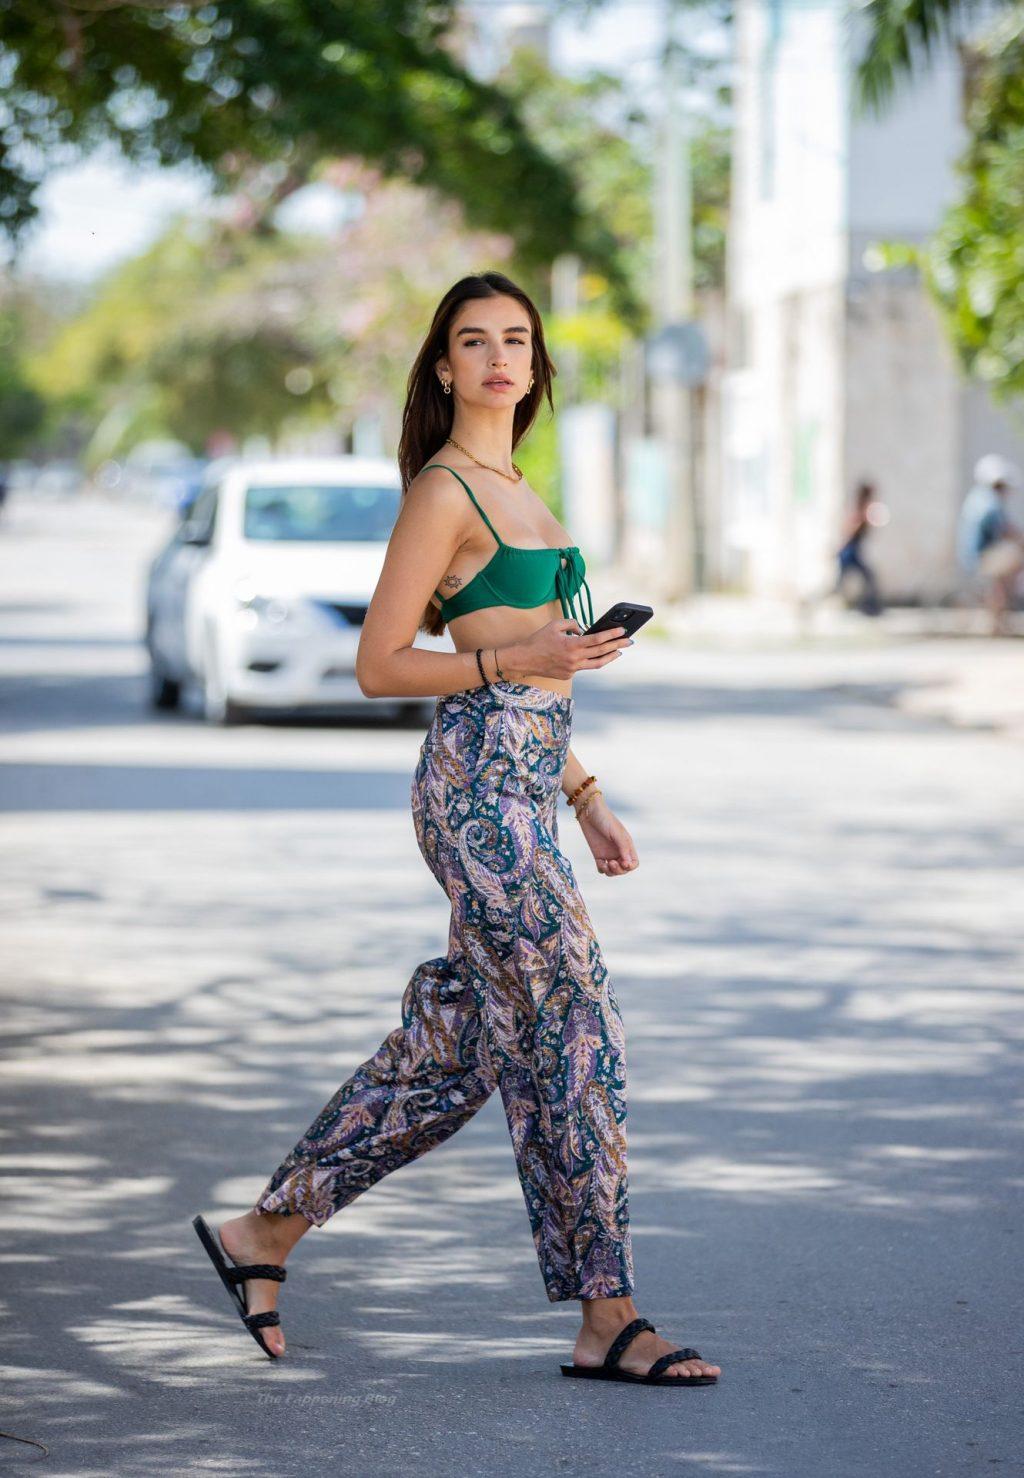 Alexandra Nicole Hot